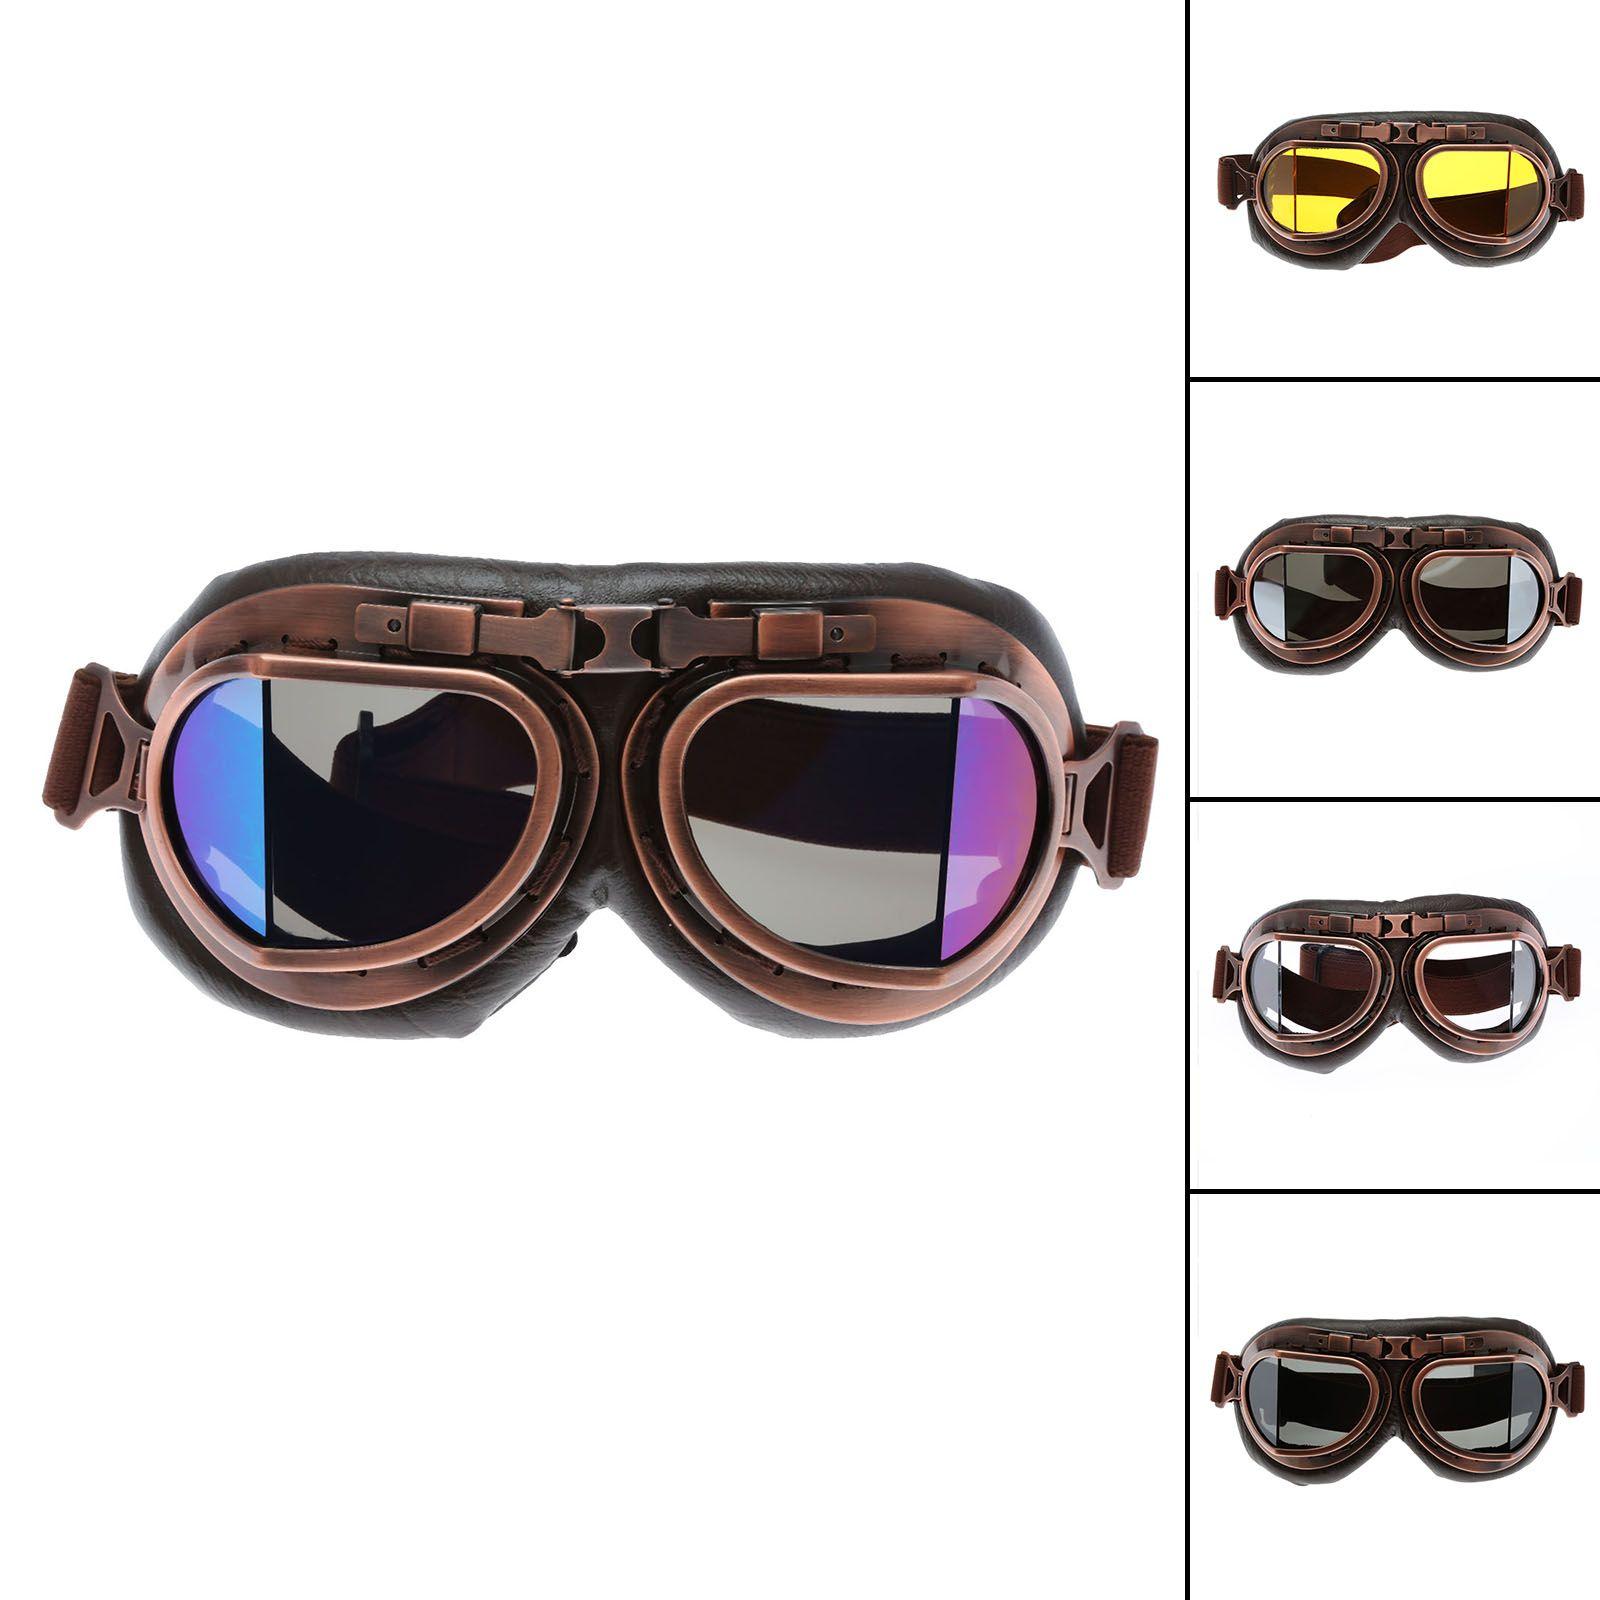 Motorcycle Goggles Glasses Vintage Motocross Classic Goggles Retro Aviator Pilot Cruiser Steampunk ATV Bike UV <font><b>Protection</b></font> Copper